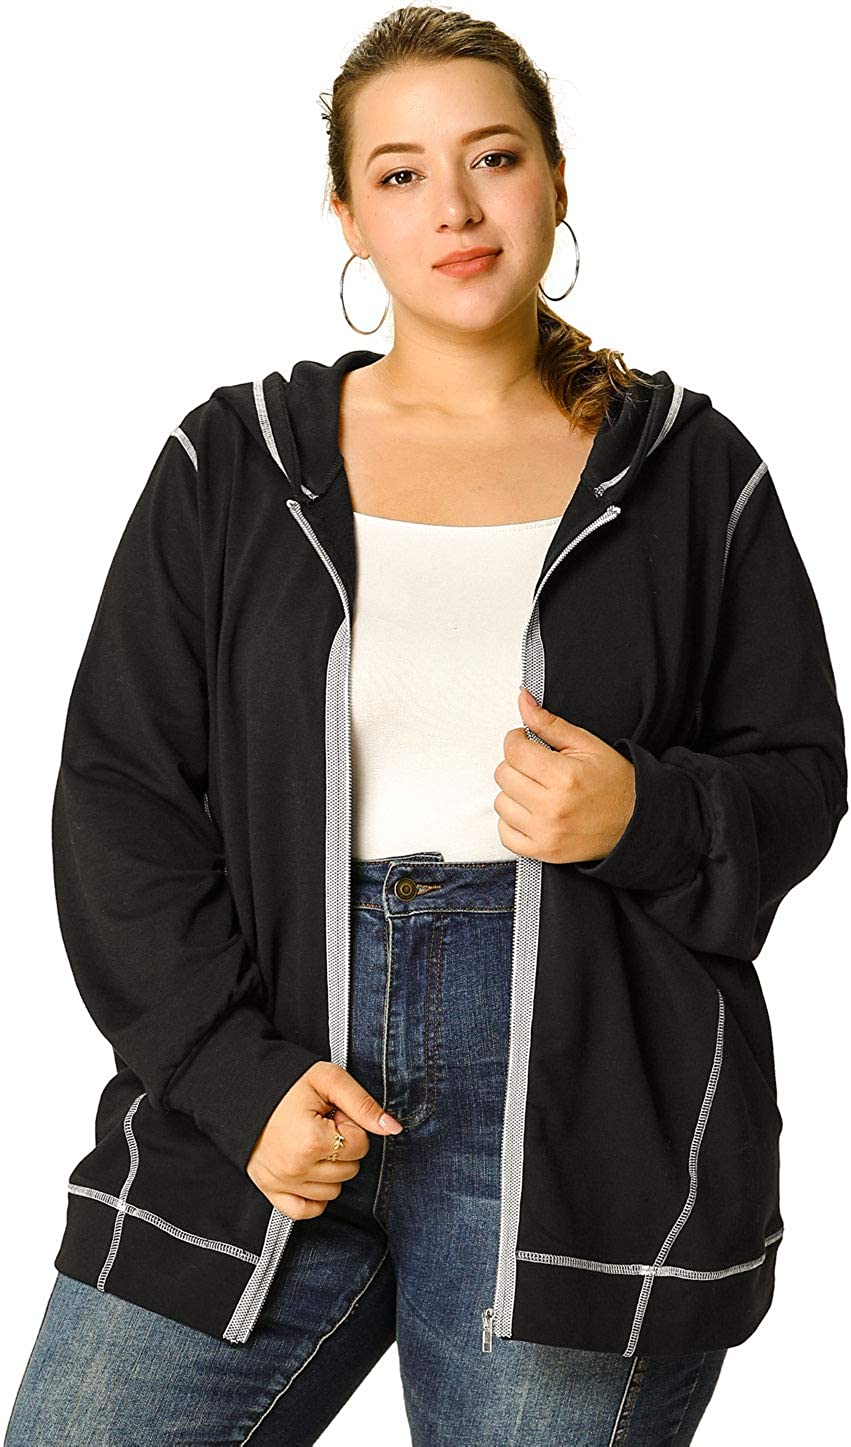 Agnes Orinda Women's Plus Size Hoodie Zip Front Long Sleeve with Pockets Casual Hoodies